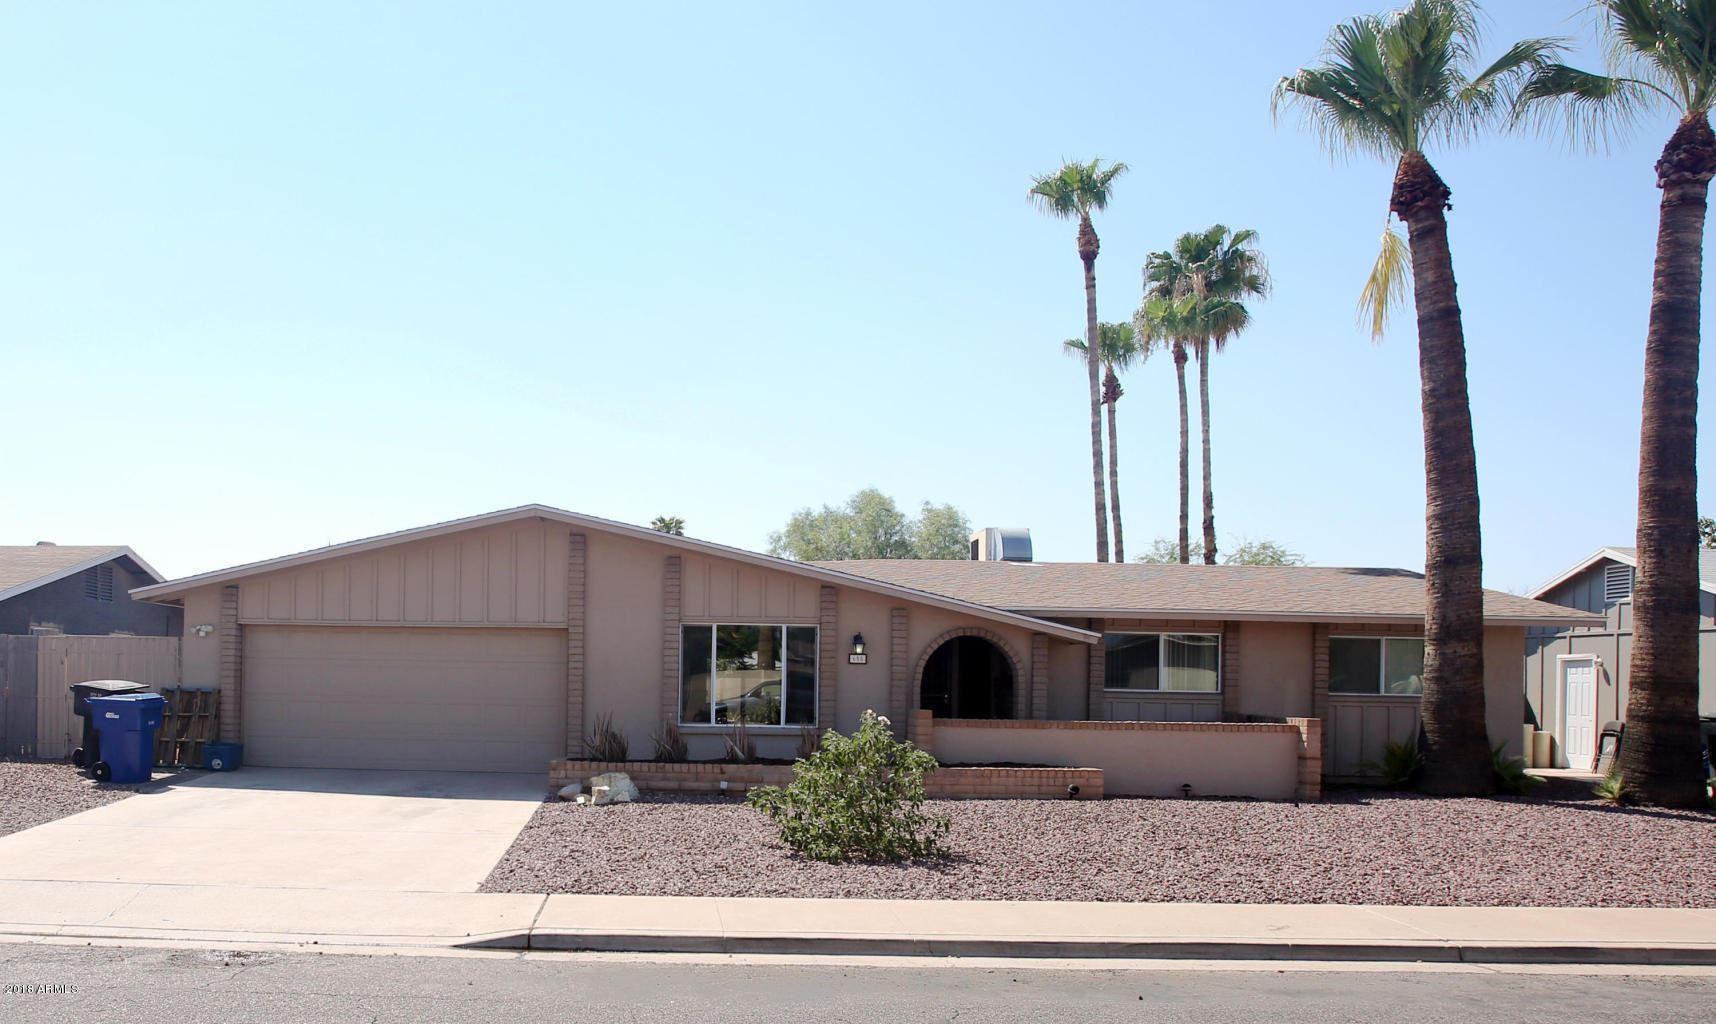 Photo of 658 S SAN JOSE --, Mesa, AZ 85202 (MLS # 6249782)